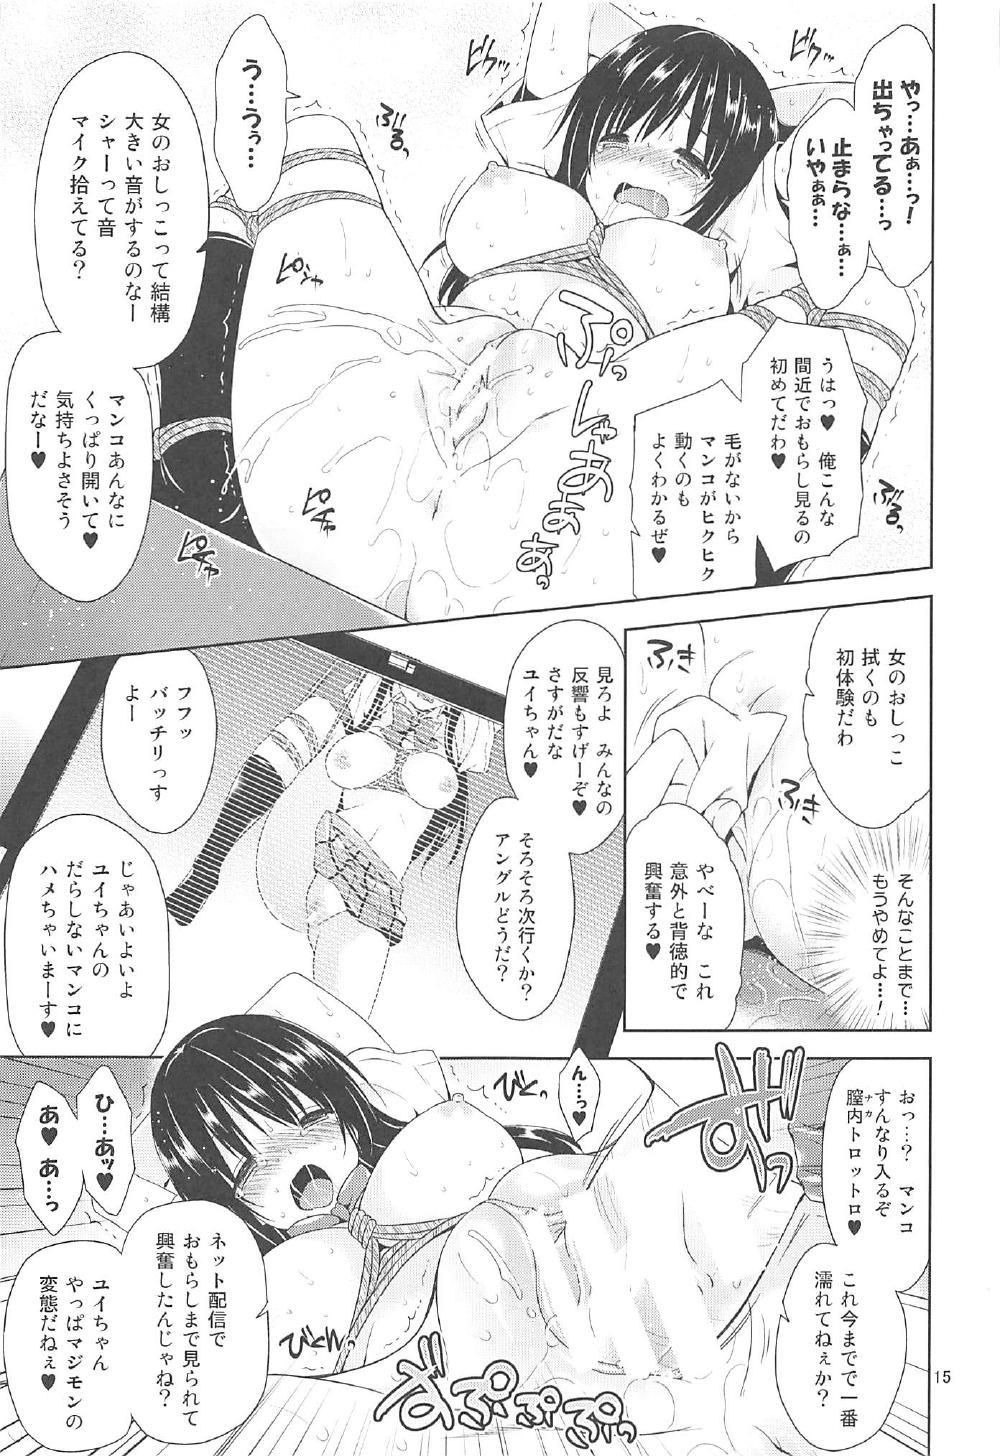 Sairoku March Trouble 3 13